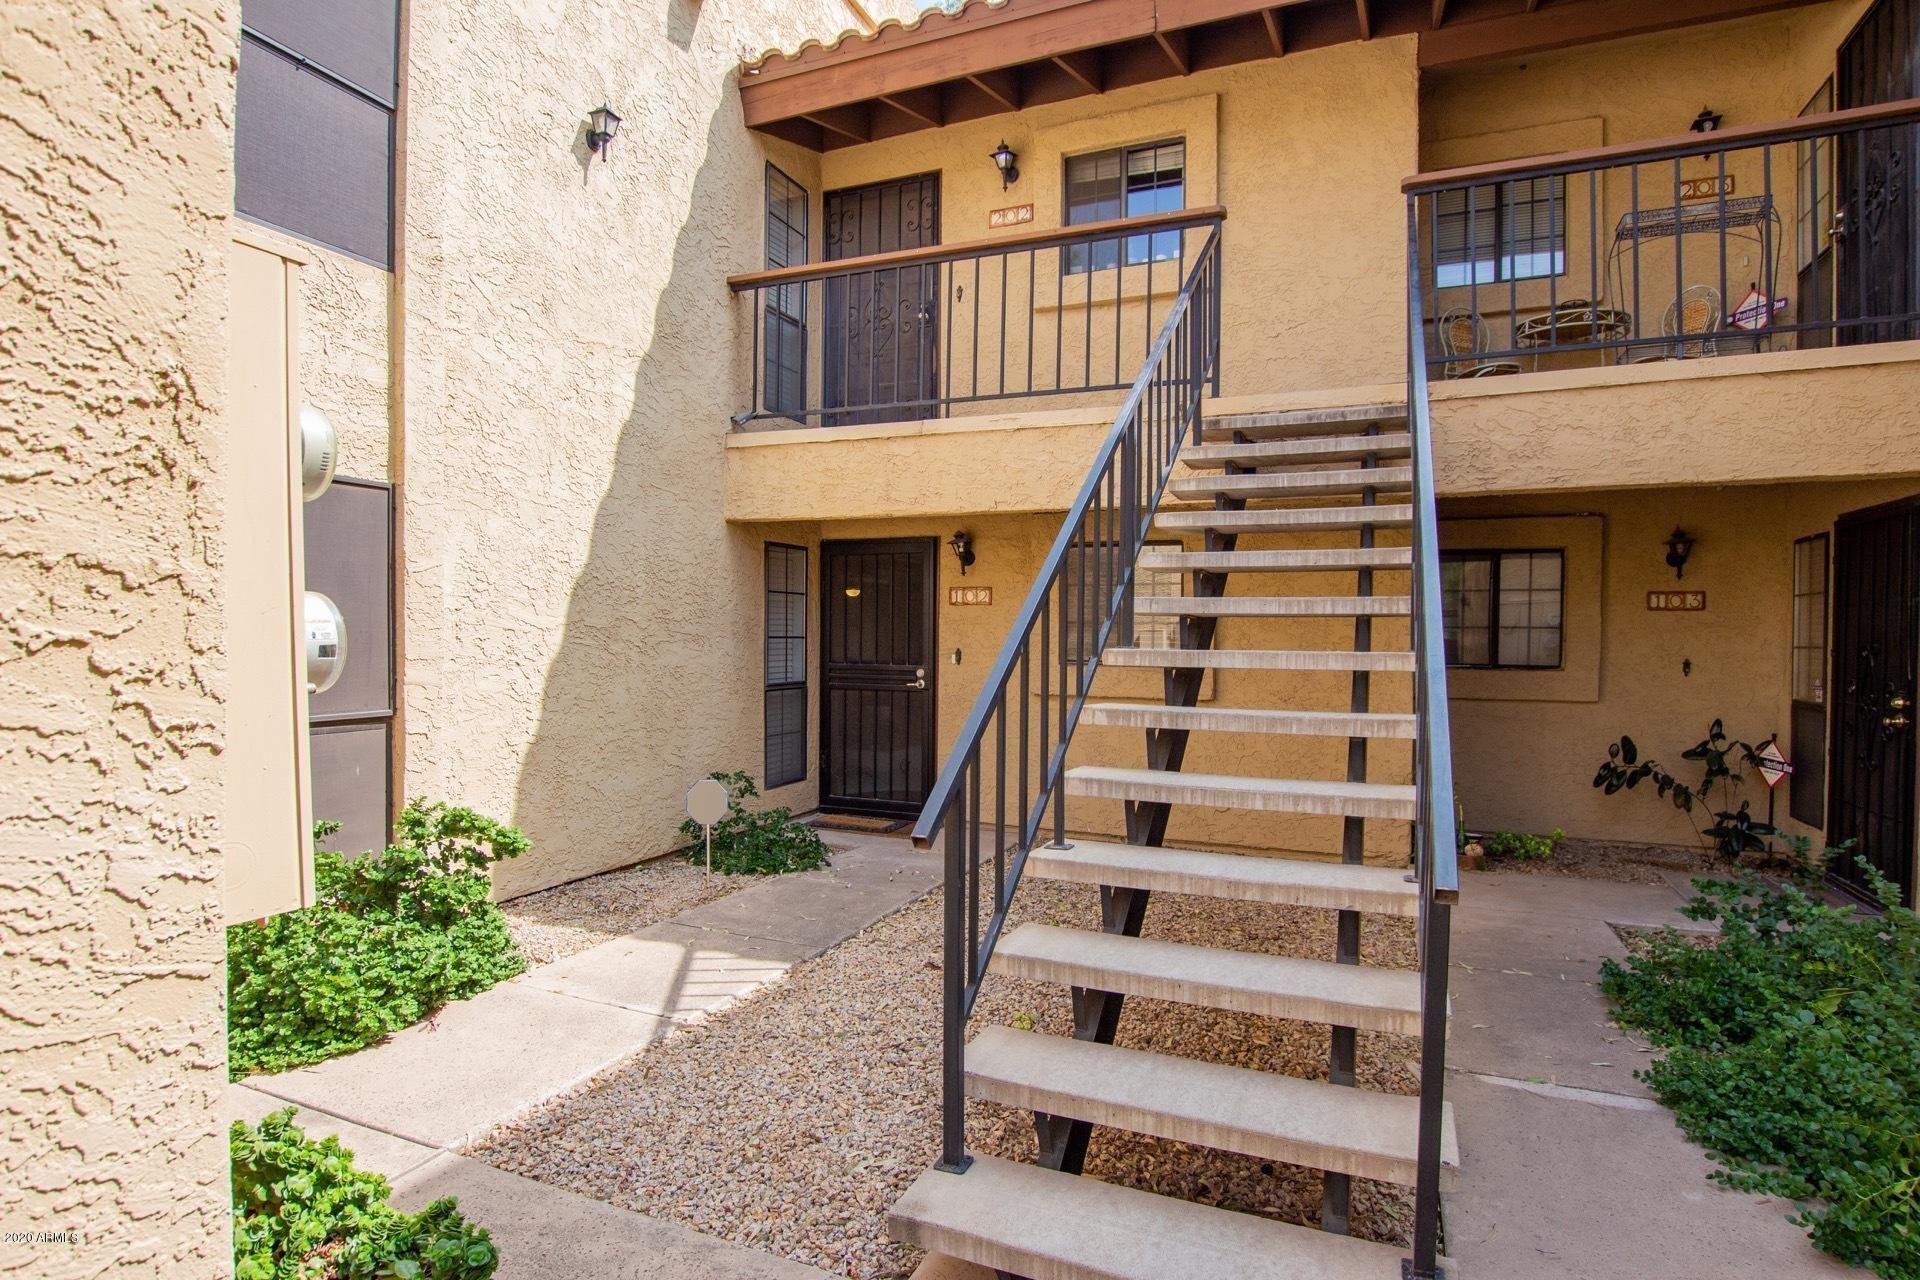 8201 N 21ST Drive #C102, Phoenix, AZ 85021 - MLS#: 6135072